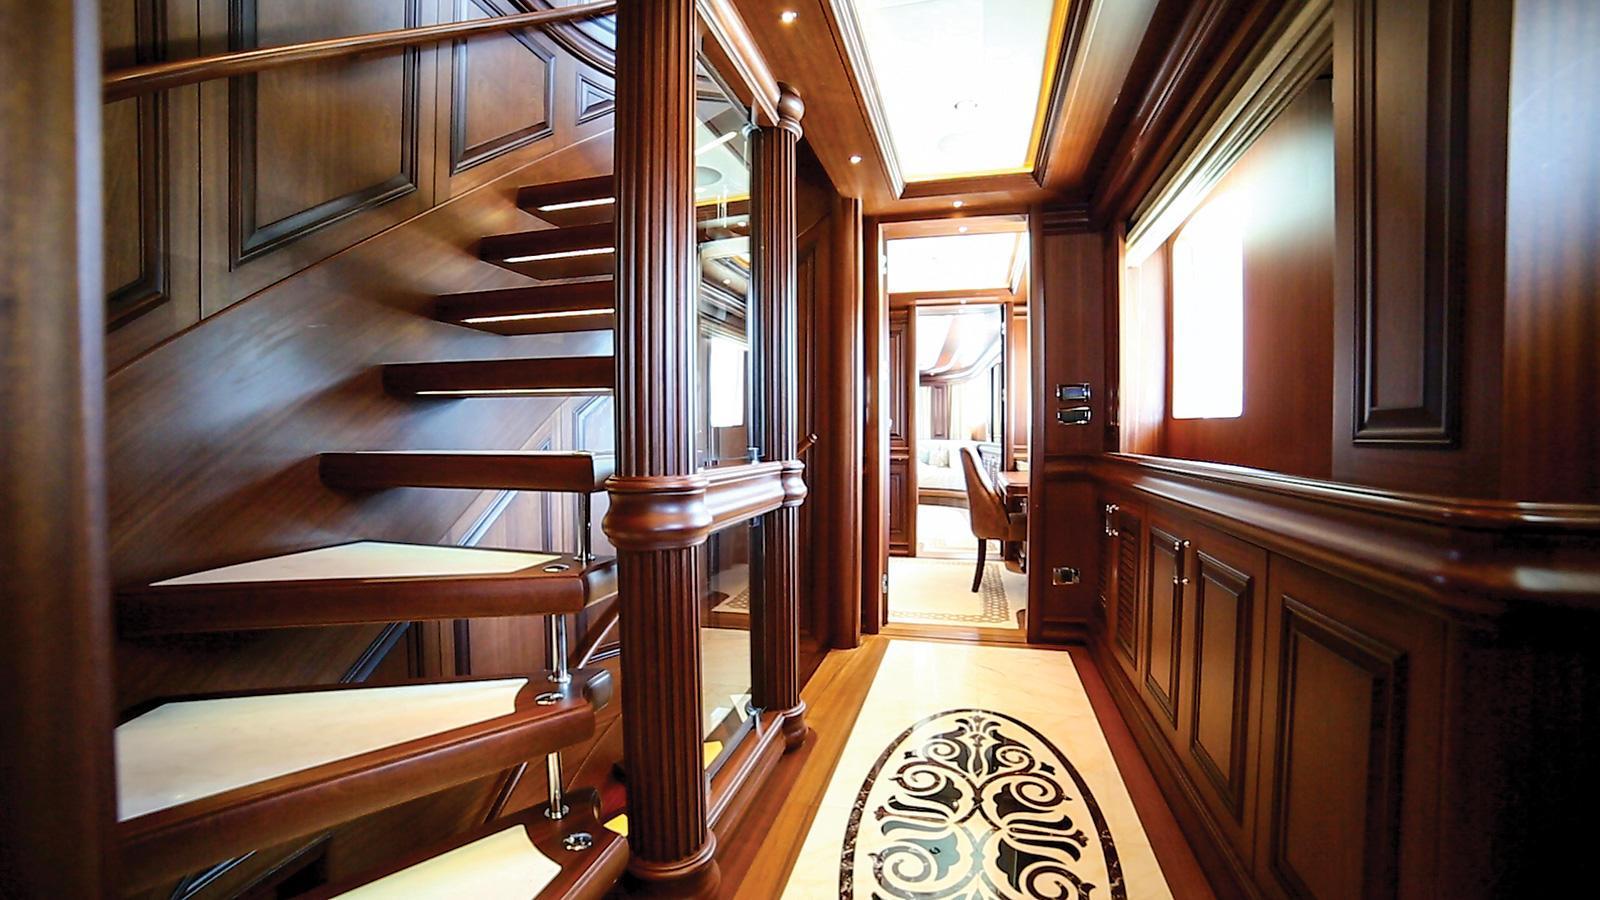 clarity-motor-yacht-bilgin-classic-160-2015-49m-hallway